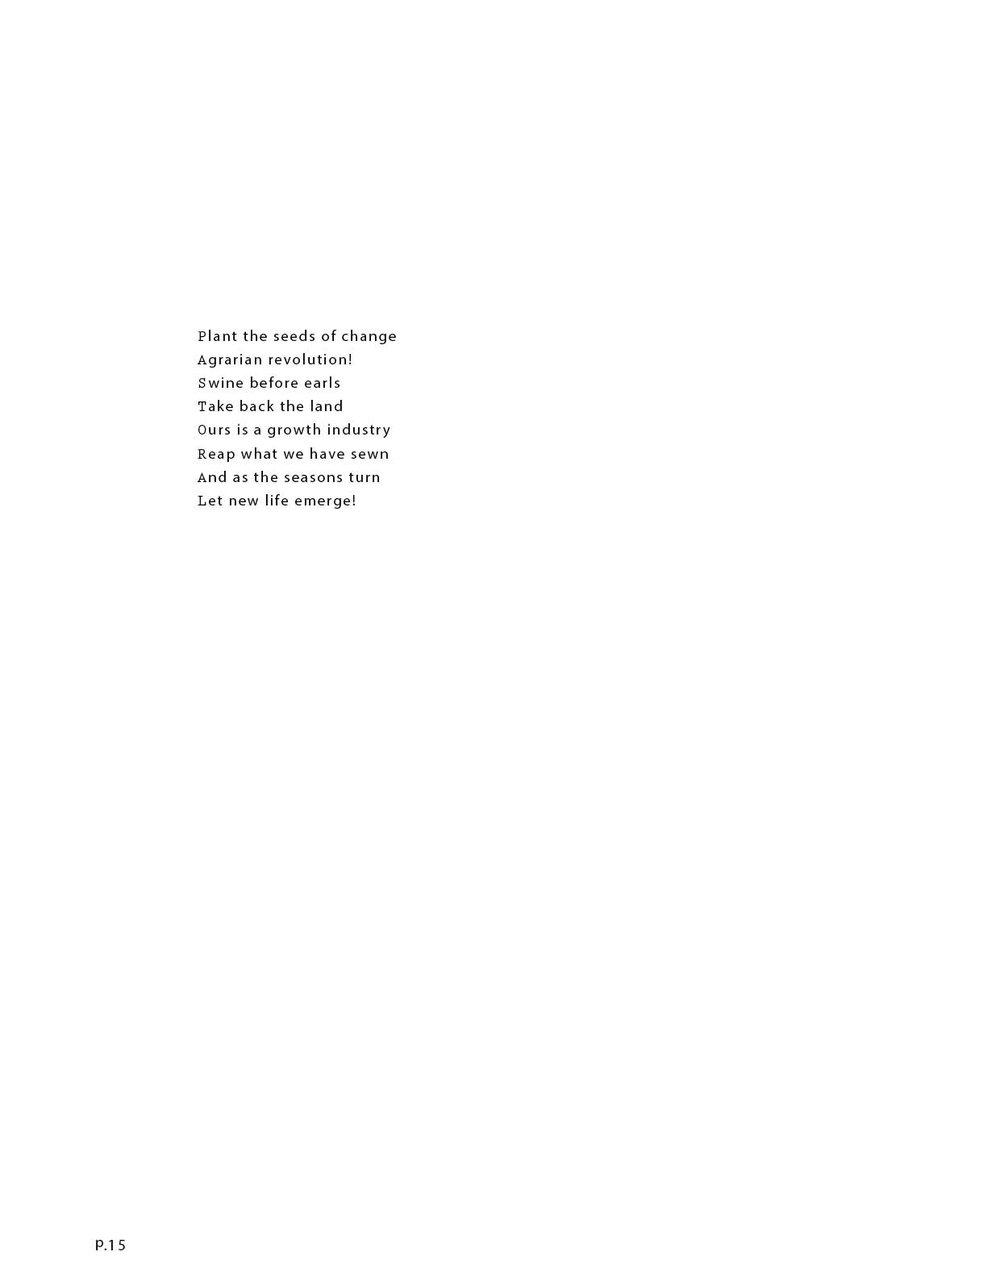 006_Toogood_Collection_Book_DIGITAL_HiRES15.jpg